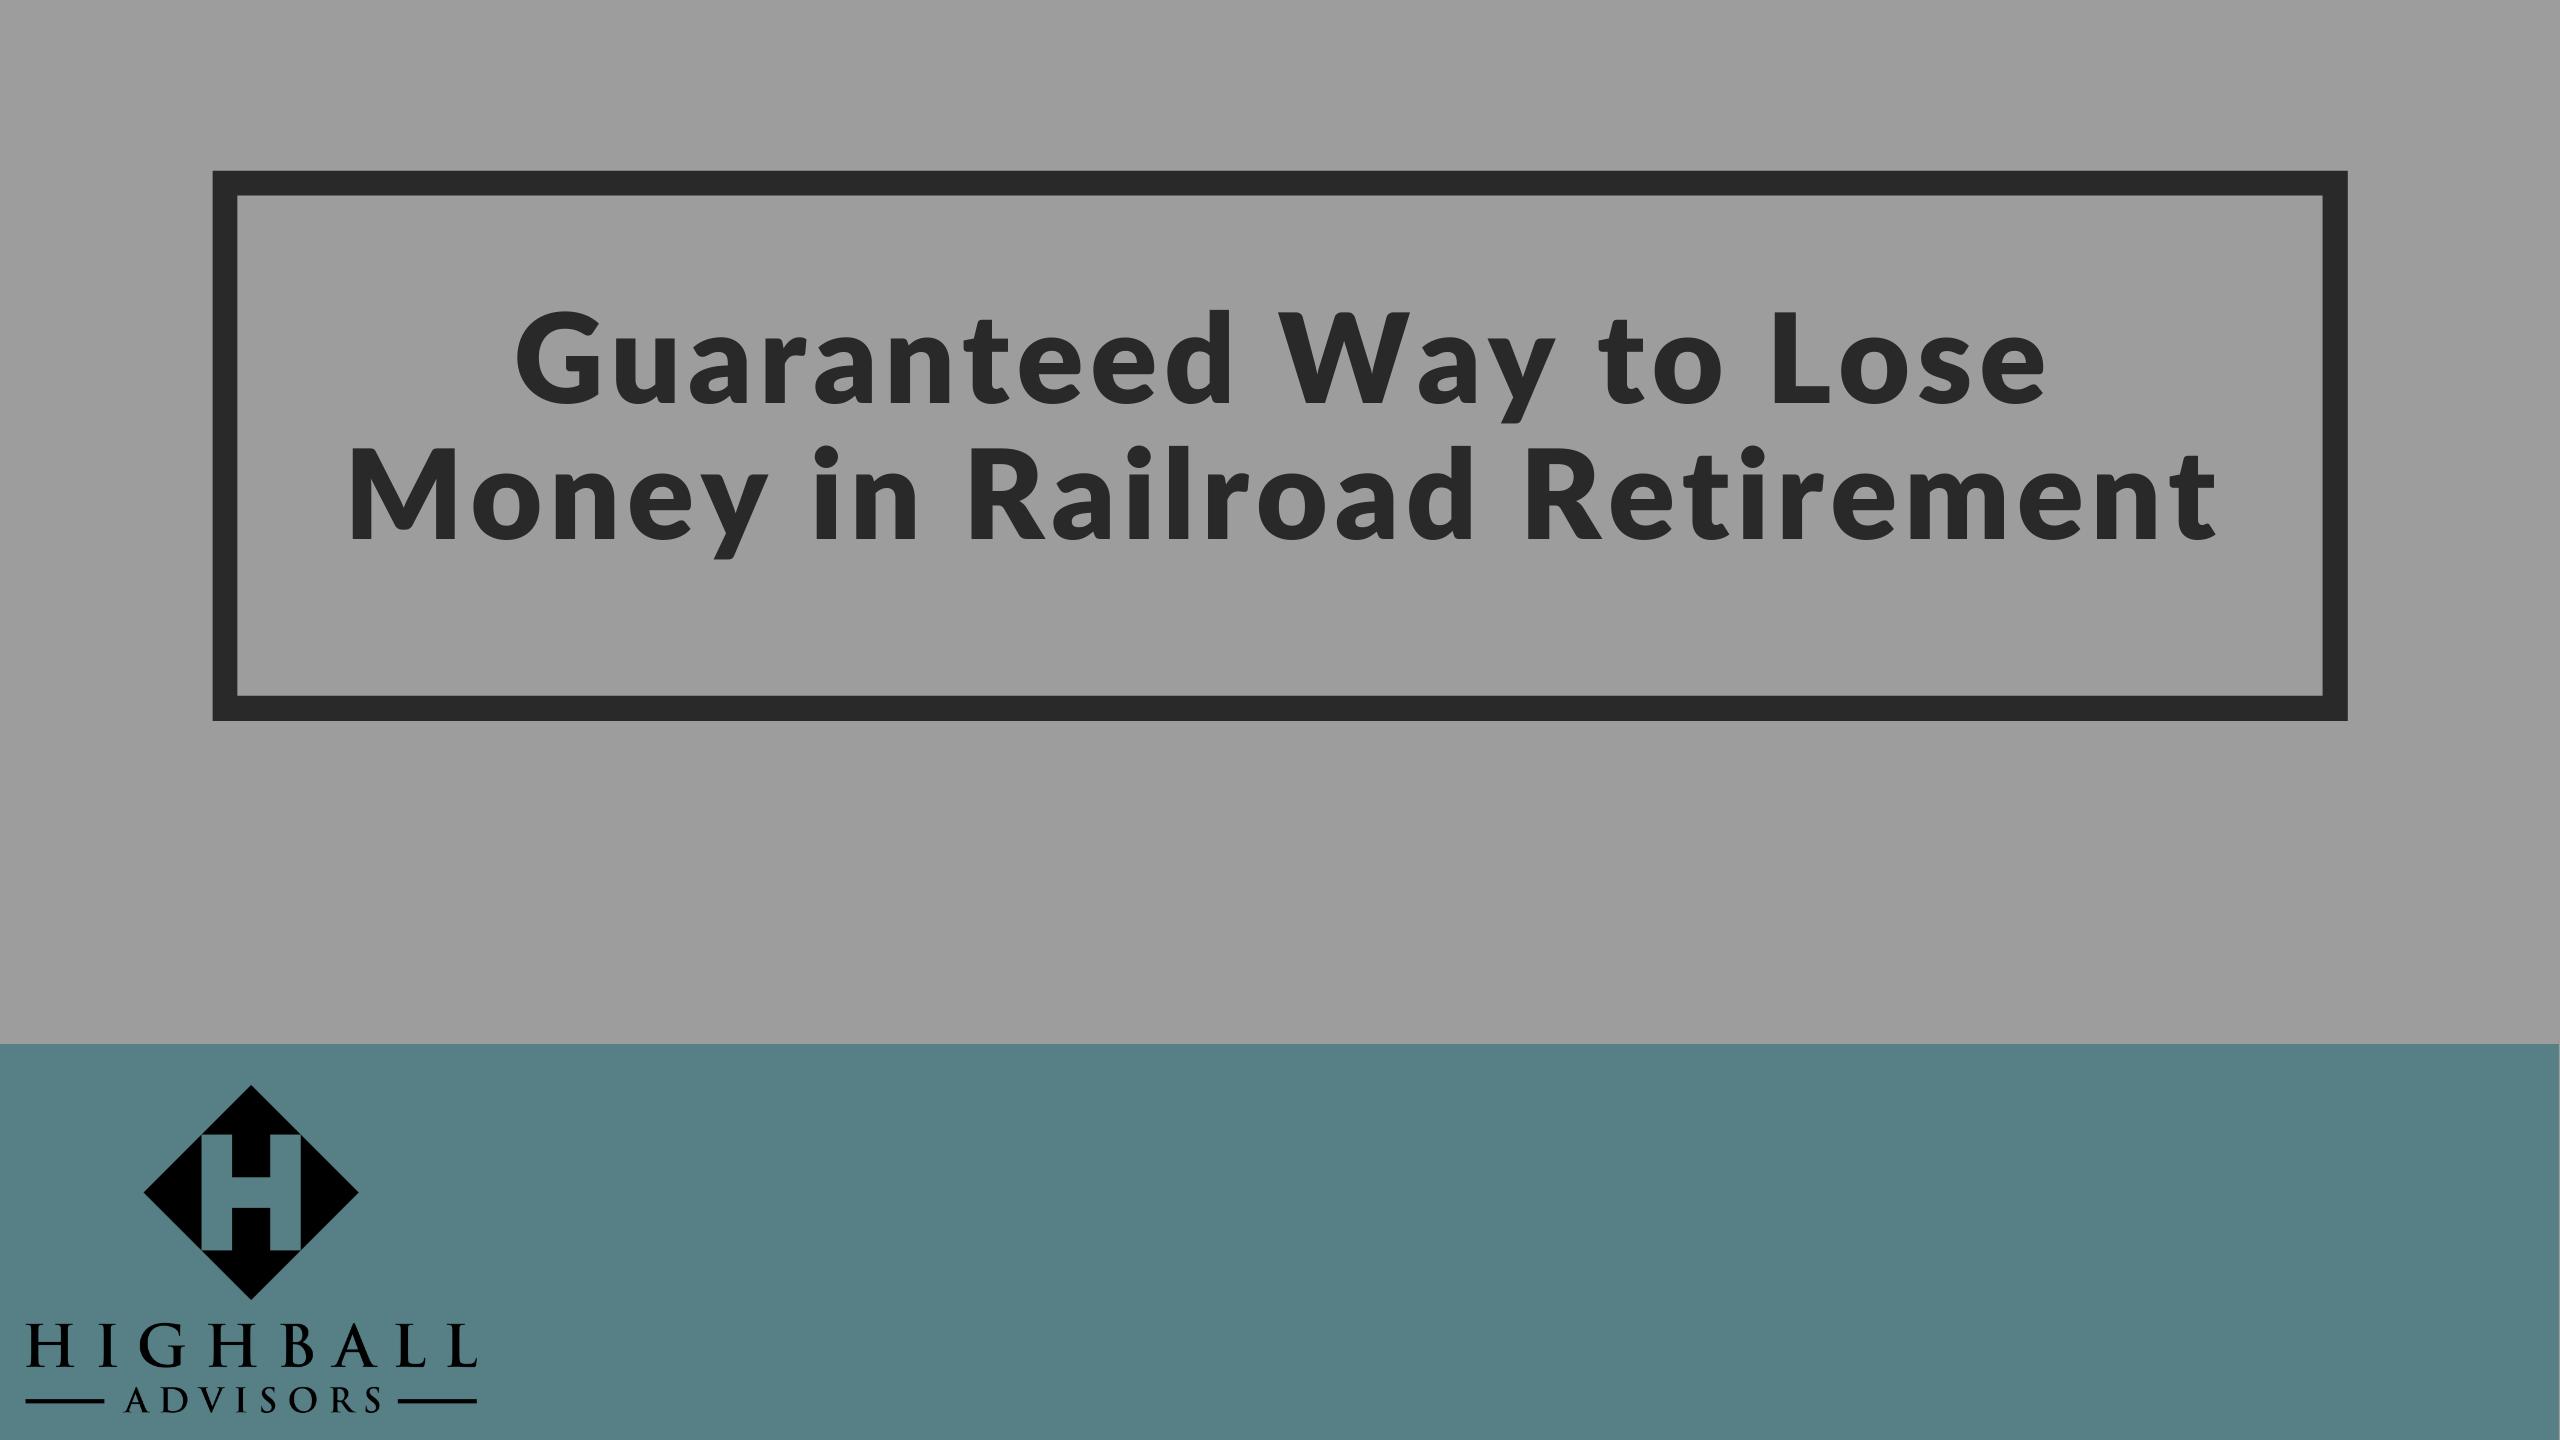 Guaranteed Way to Lose Money in Railroad Retirement Thumbnail